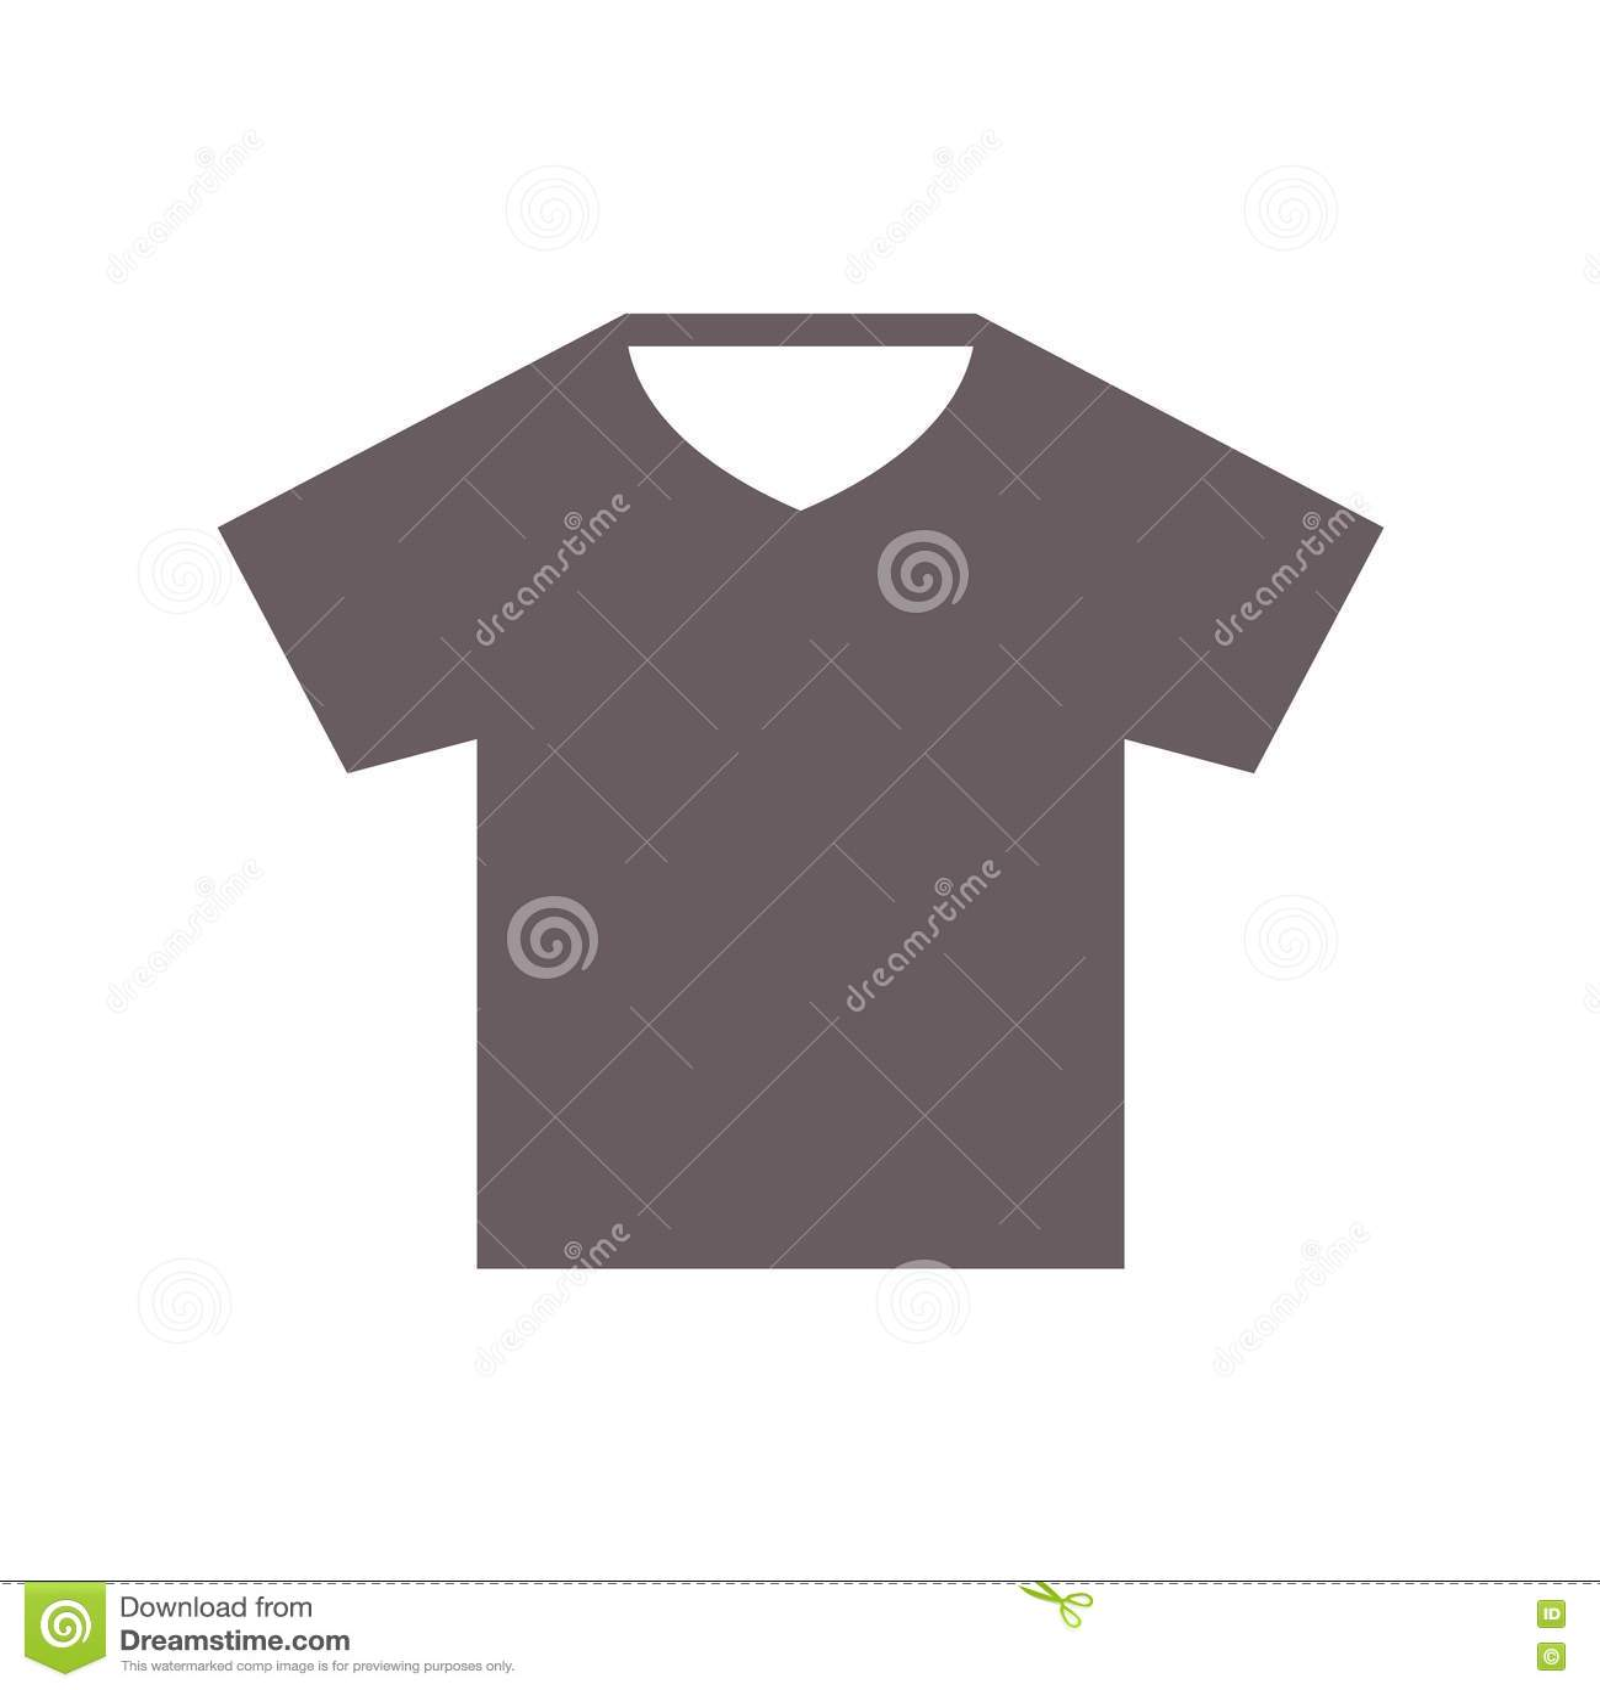 Black t shirt vector - Icon Illustration Shirt